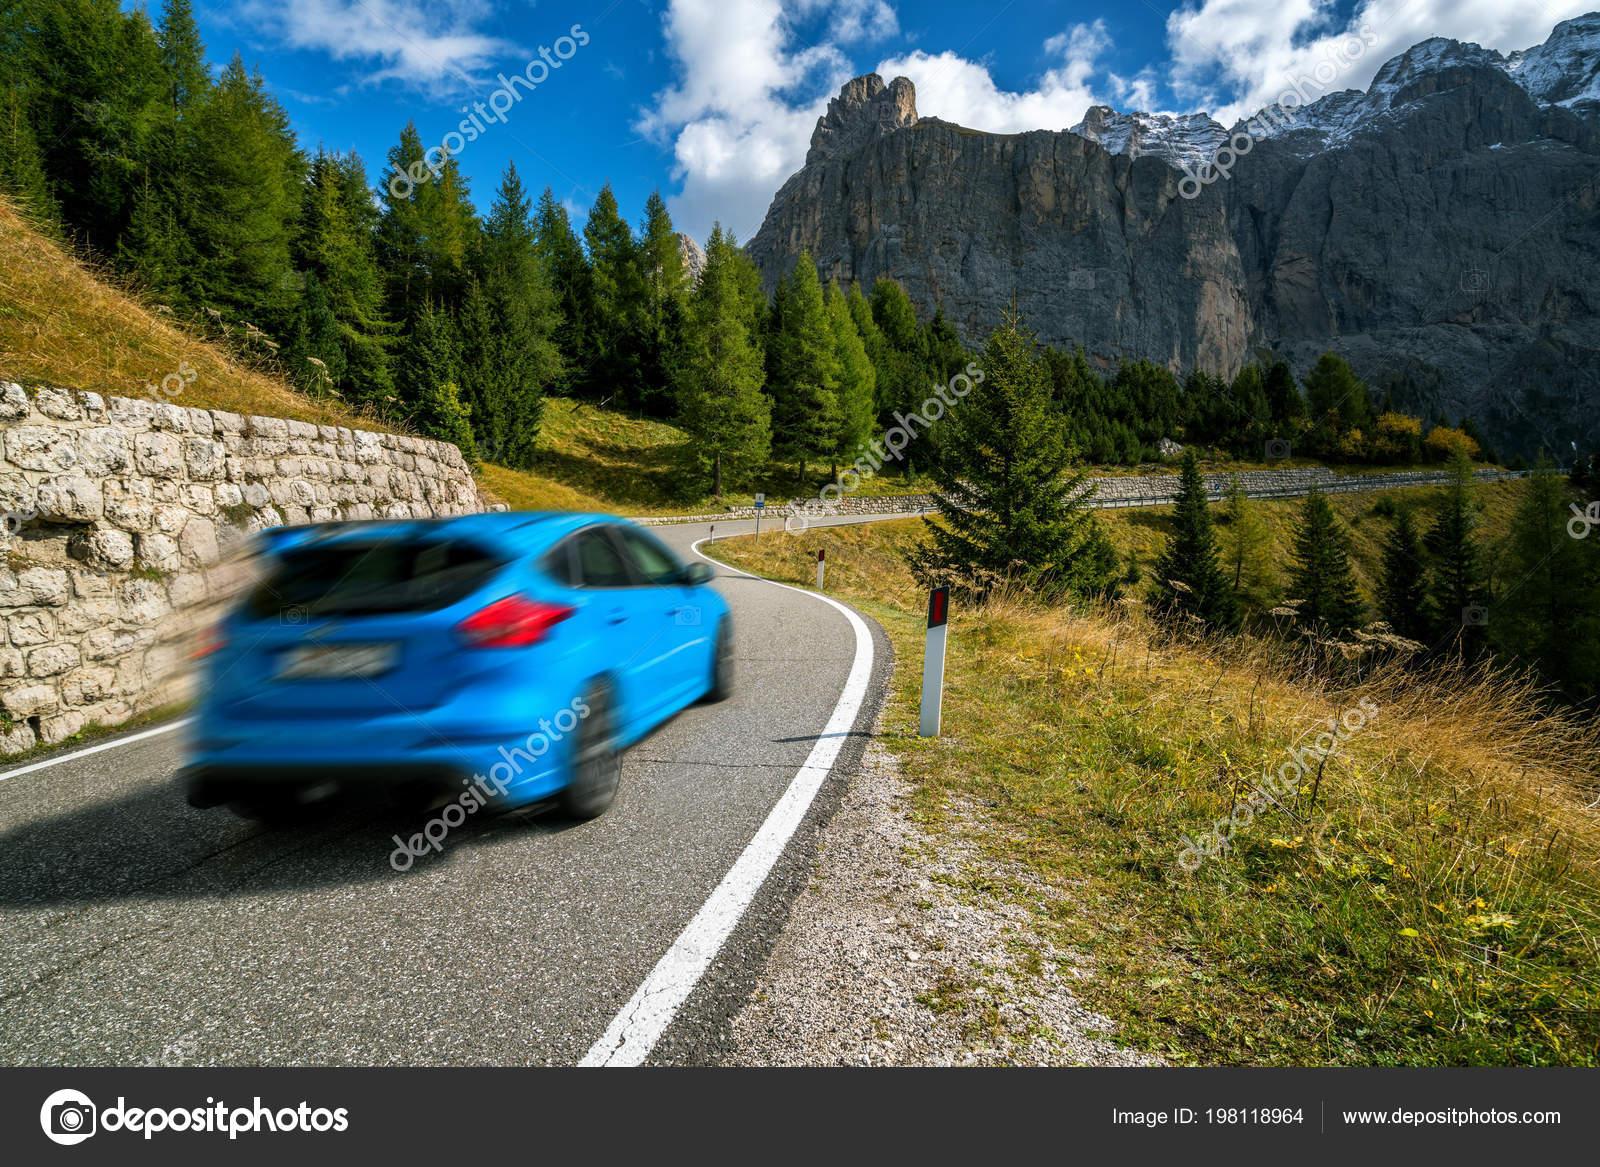 mountains backgrounds. Car Driving Beautiful Mountain Road Trees Forest Mountains Backgrounds Taken \u2014 Stock Photo